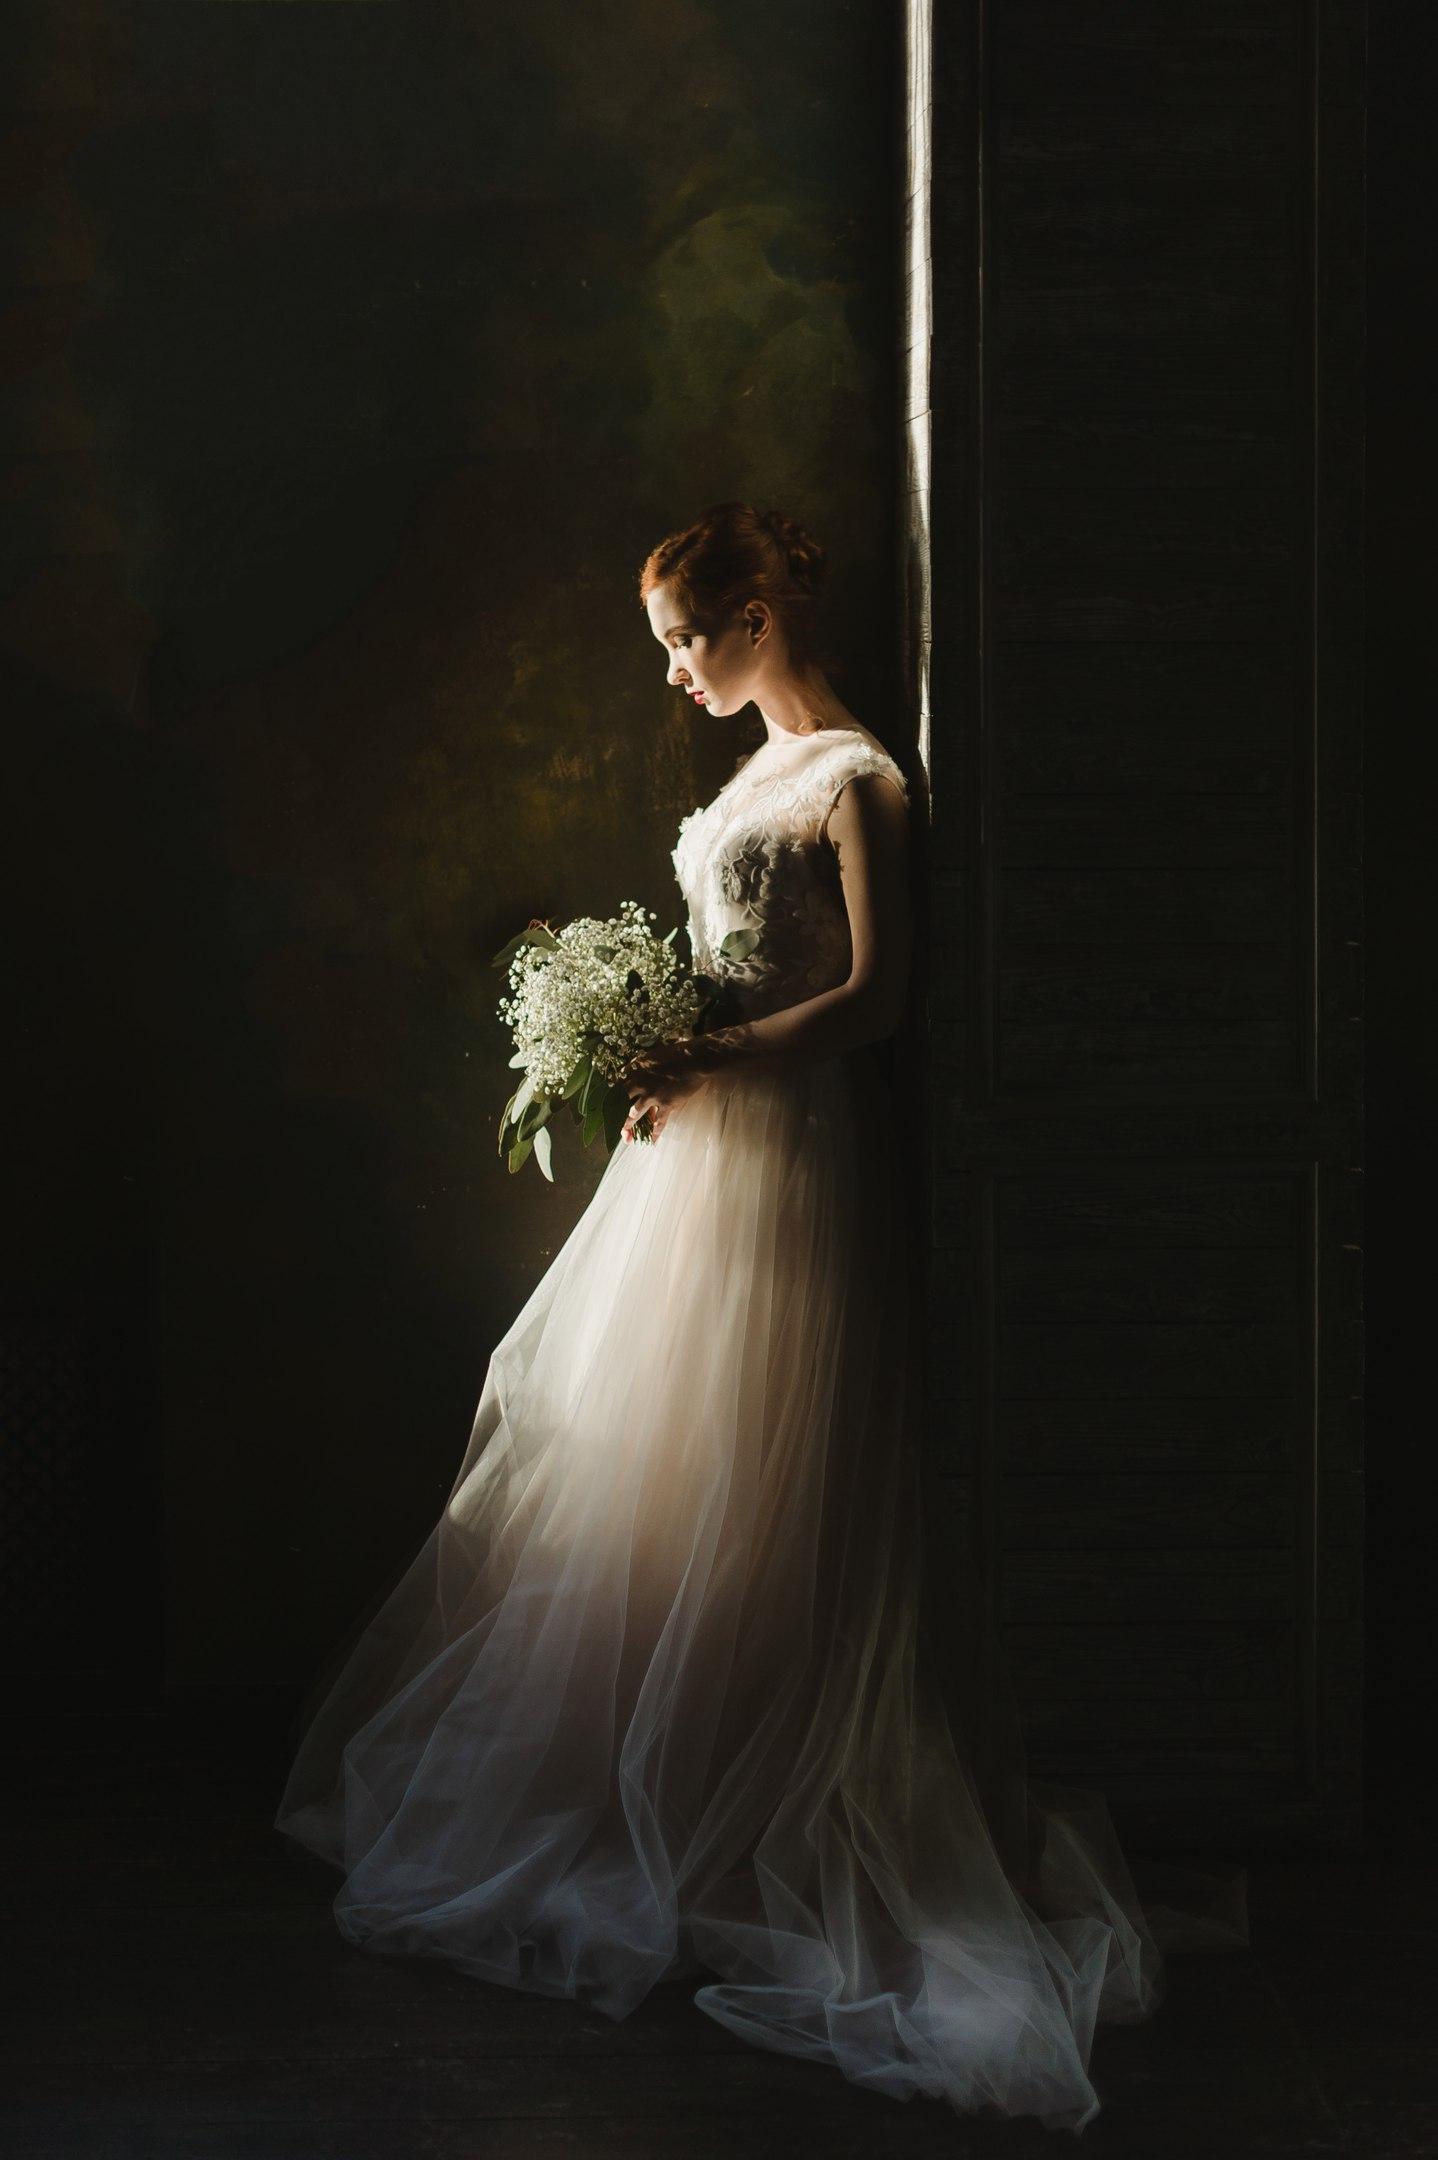 cheap_wedding_videographer_new_orleans